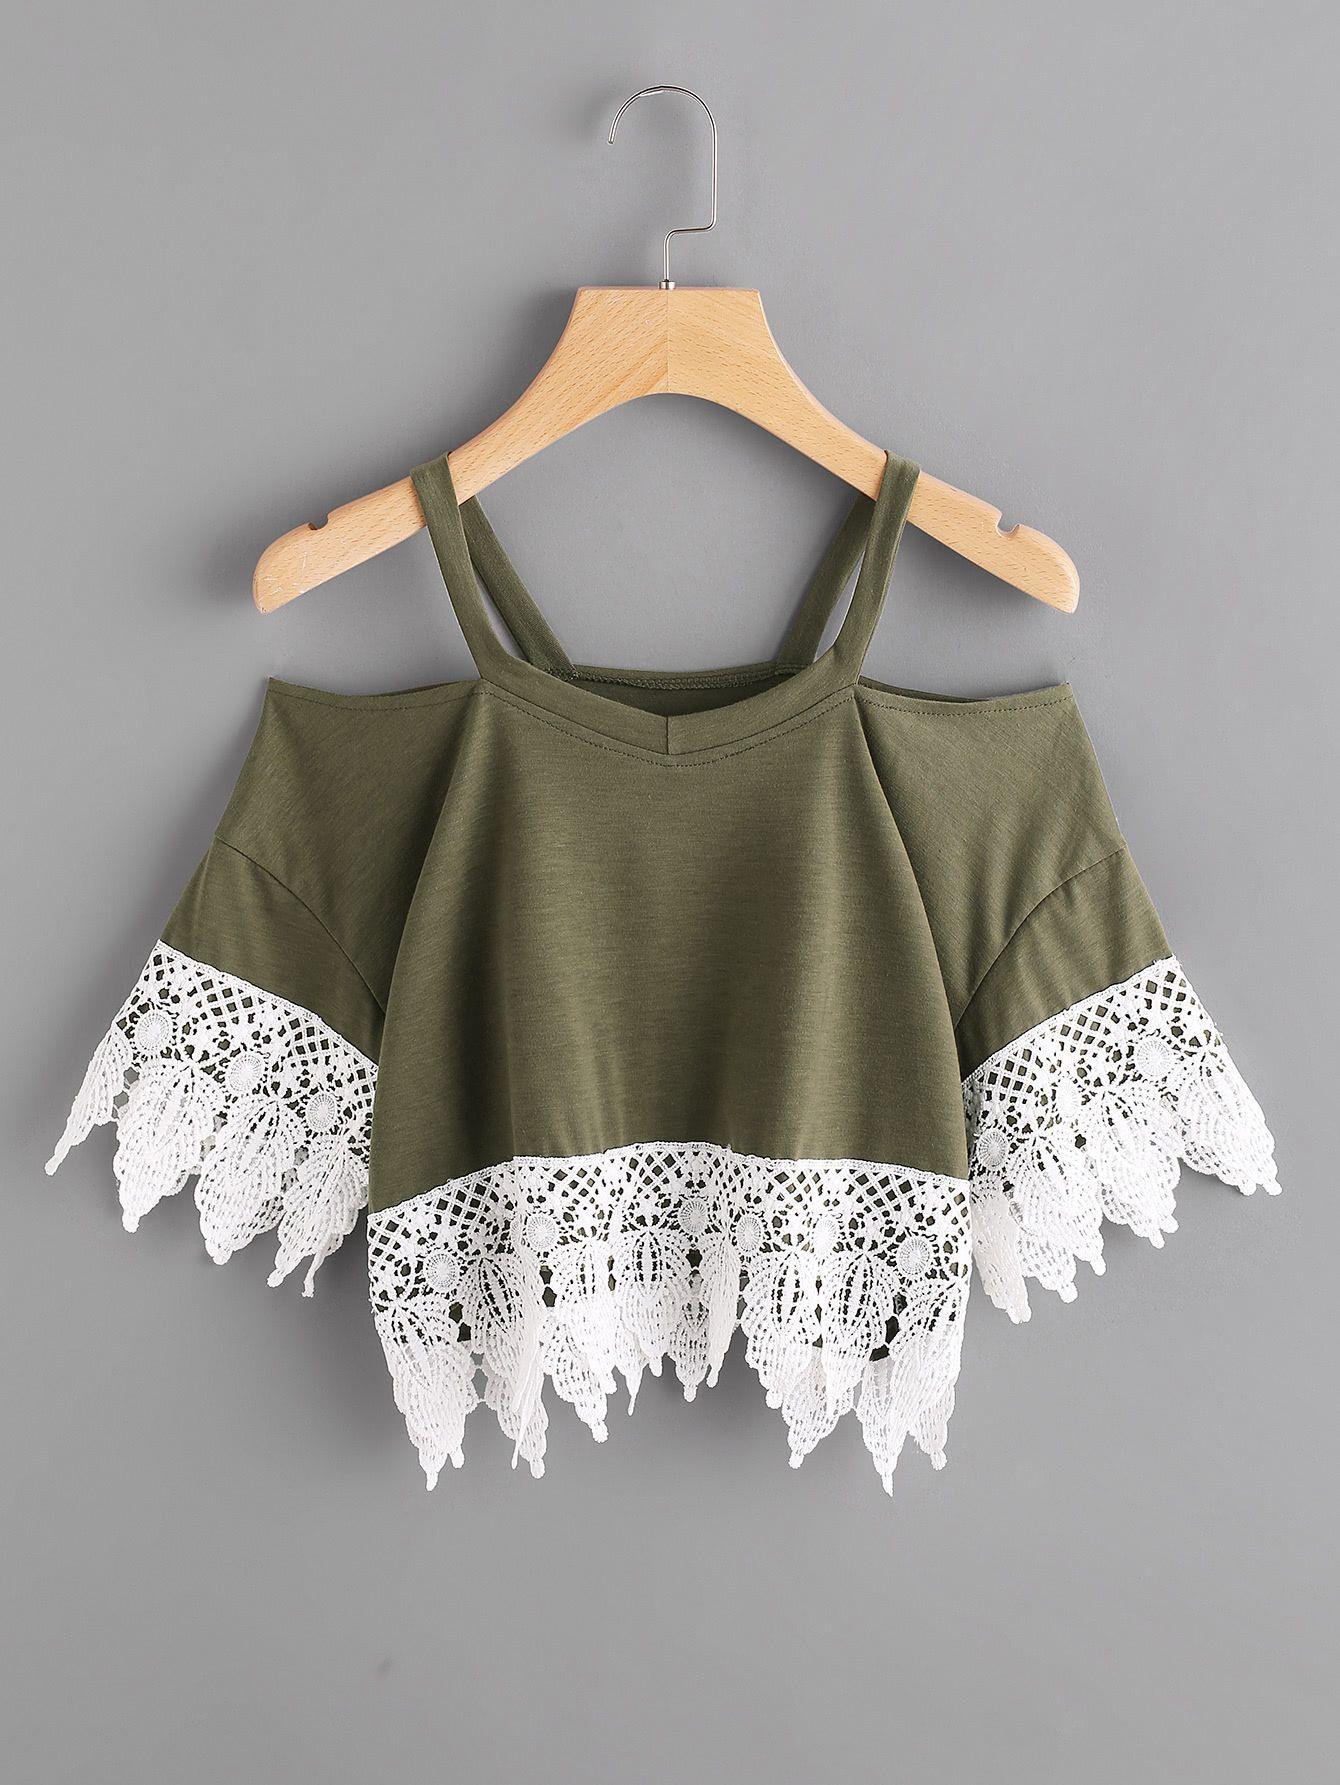 Contrast Crochet Lace Trim Tee – clothes